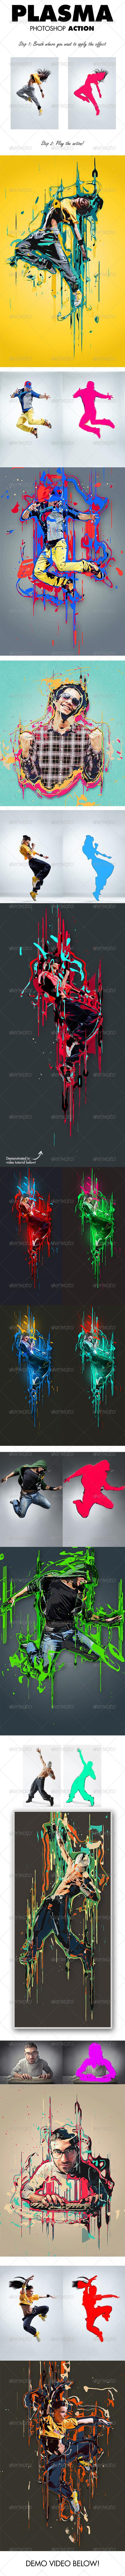 GraphicRiver Plasma Photoshop Action 8728151